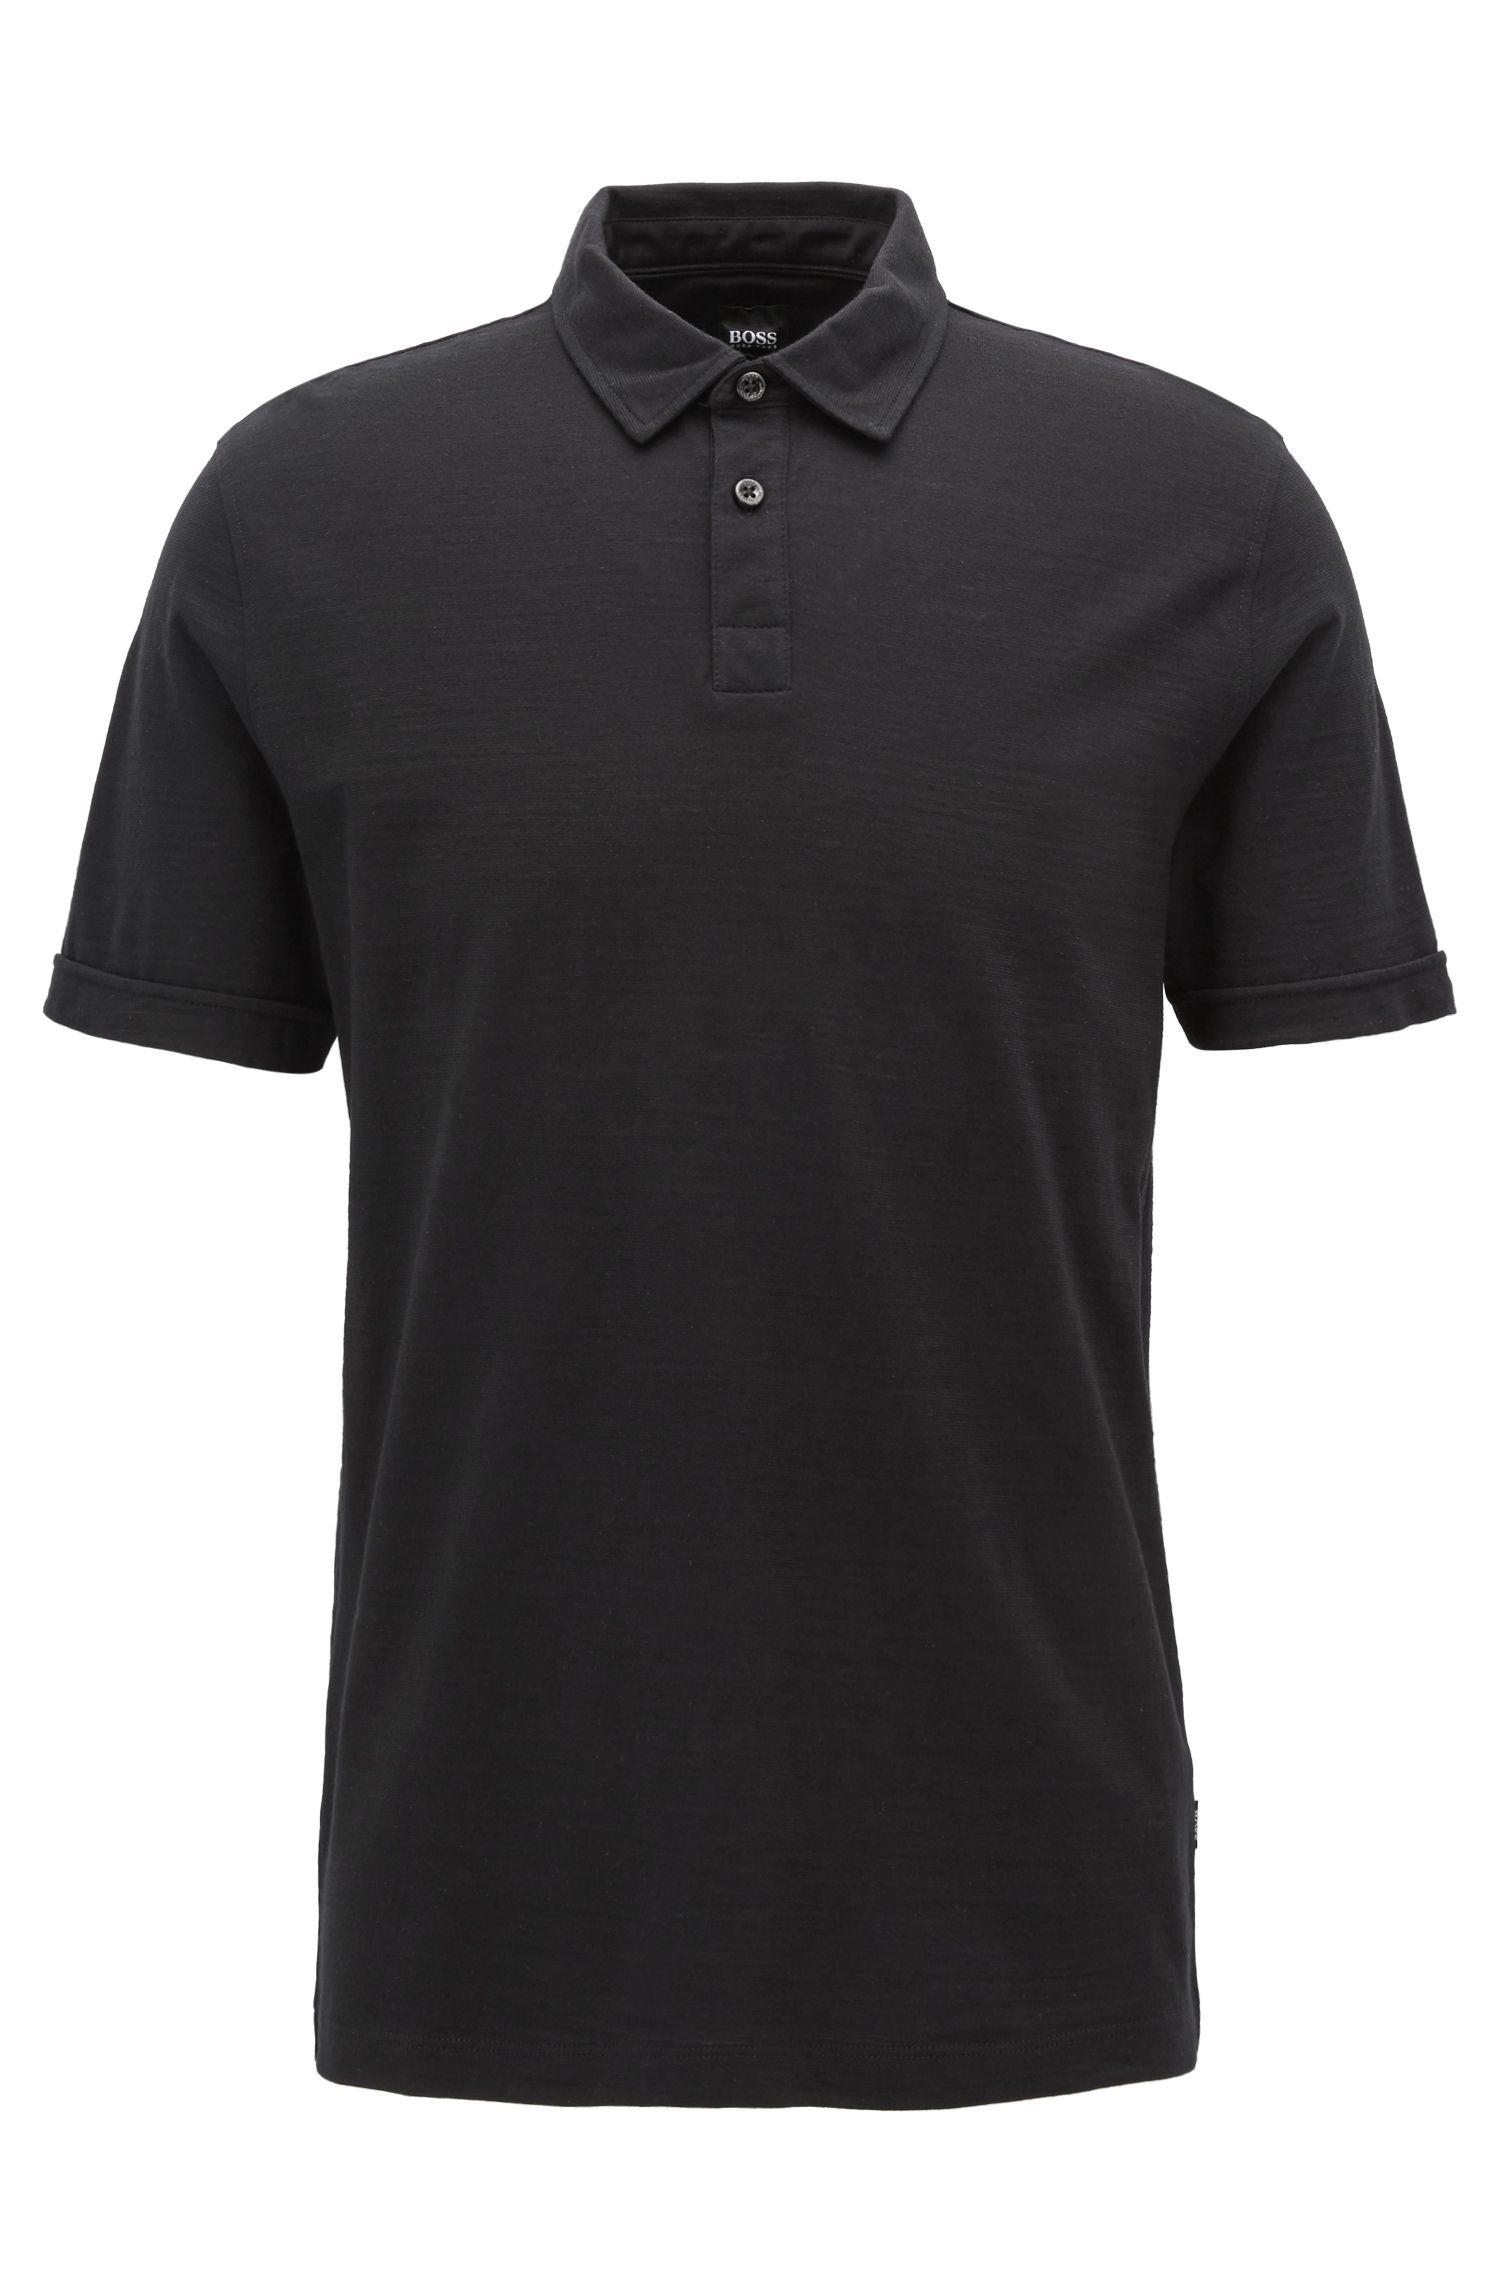 Poloshirt aus merzerisiertem Single Jersey